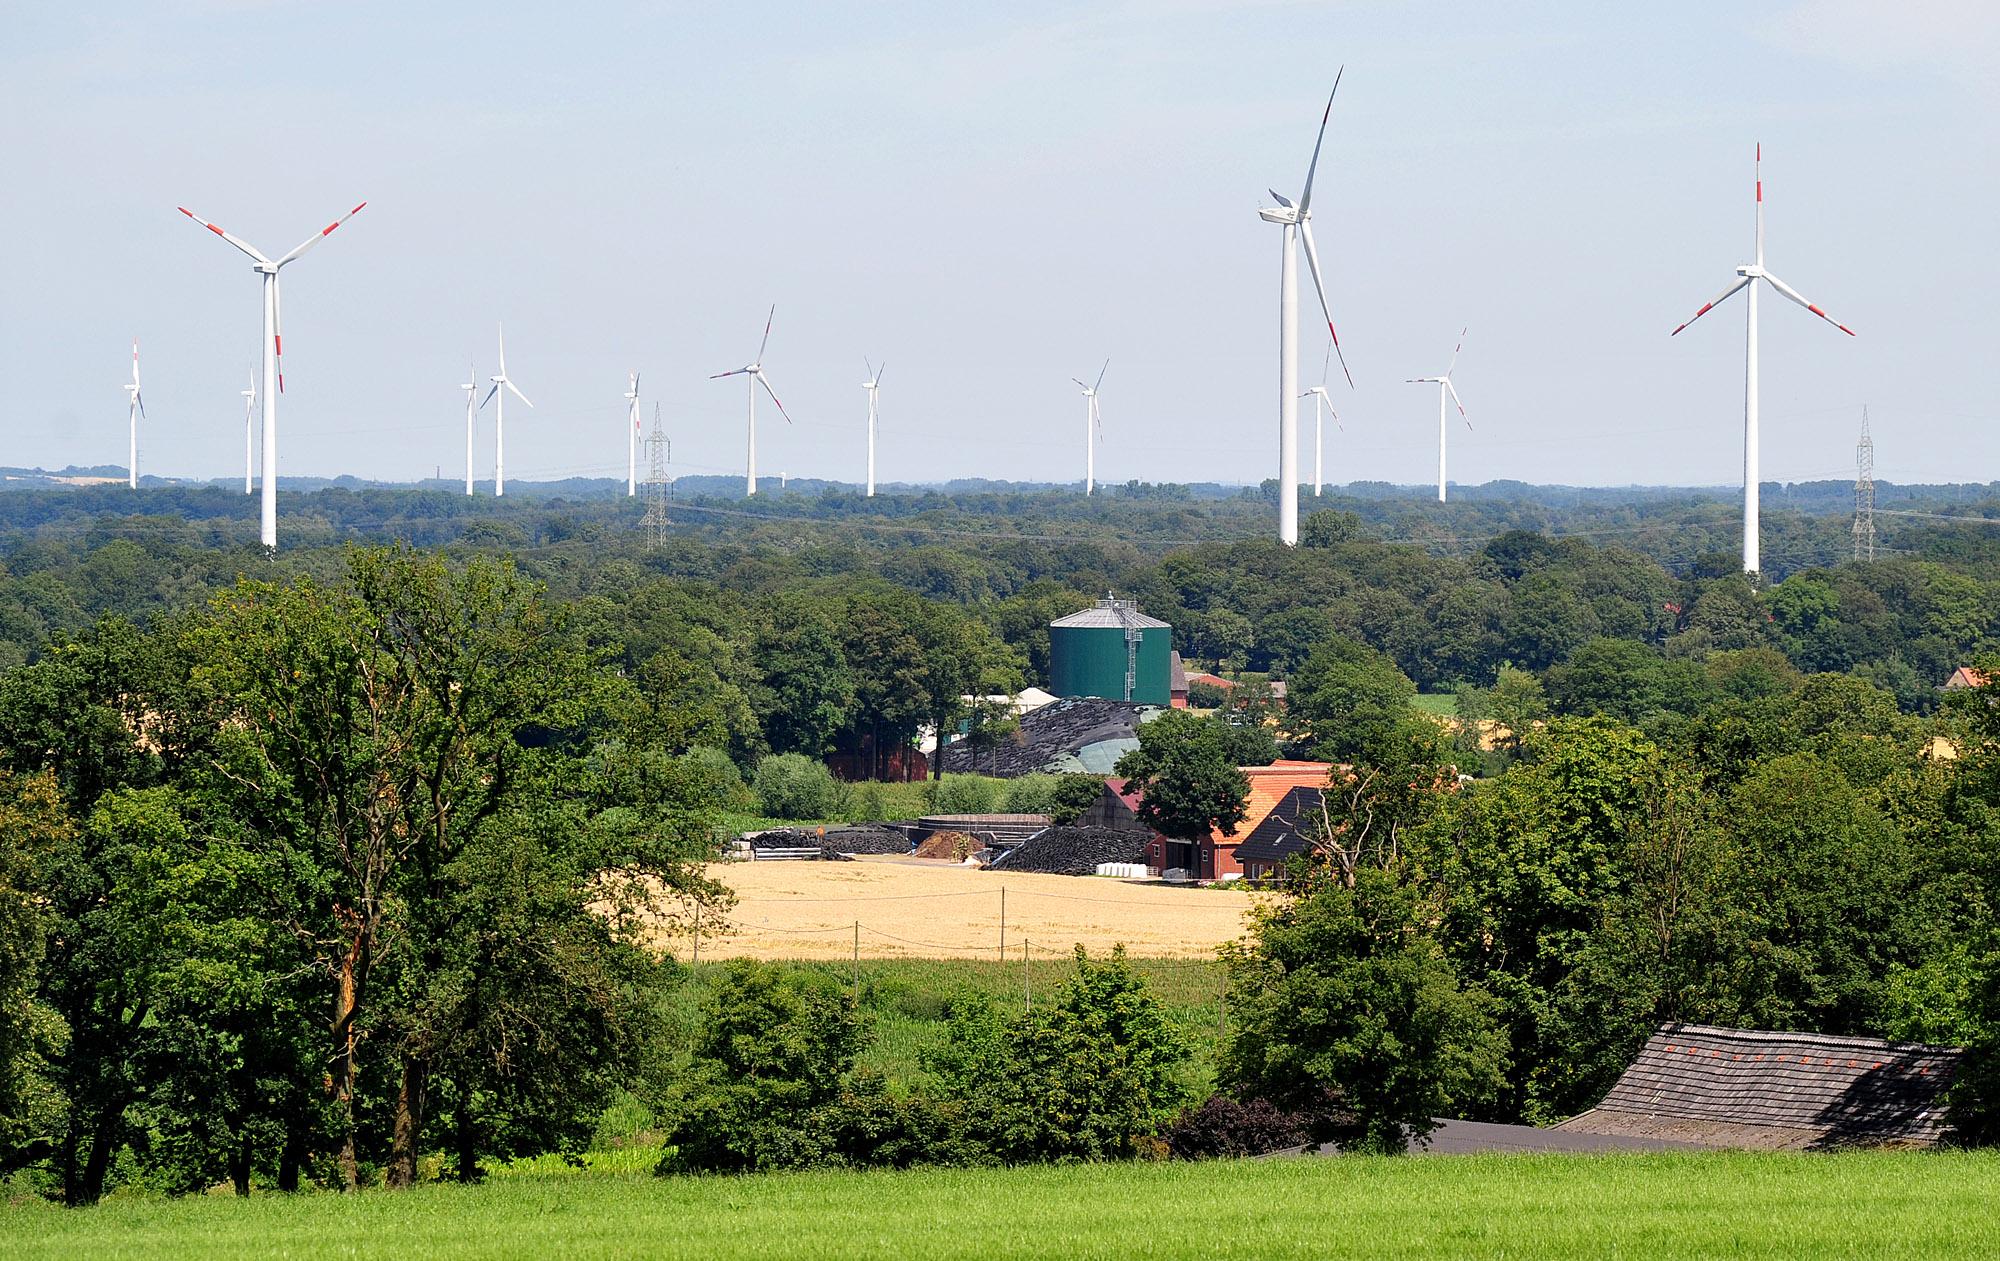 Kommunale Energiewende Windanlagen Kreis Steinfurt